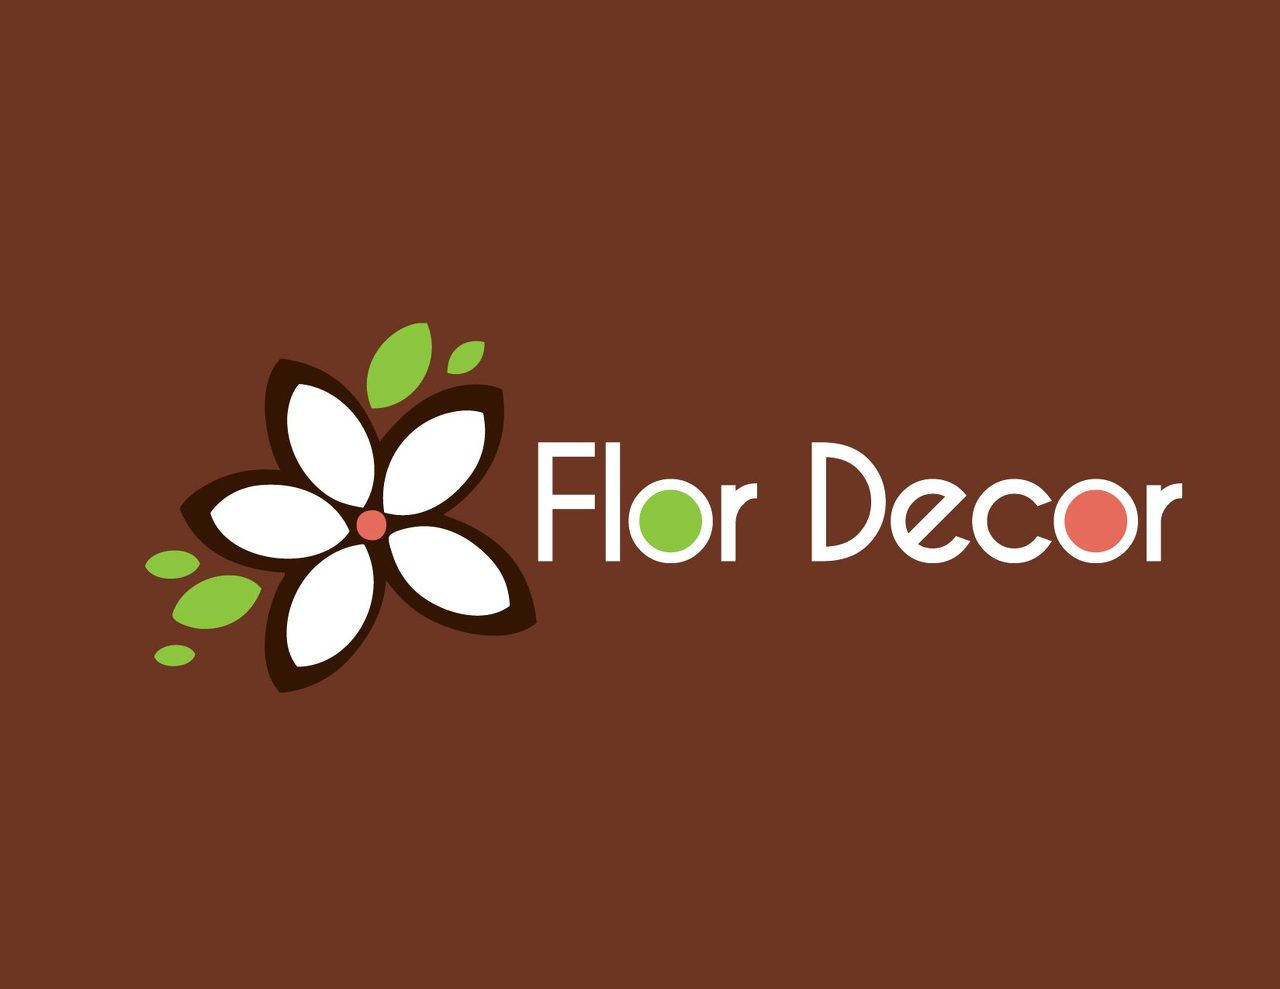 flor decorjpg - Flor Decor